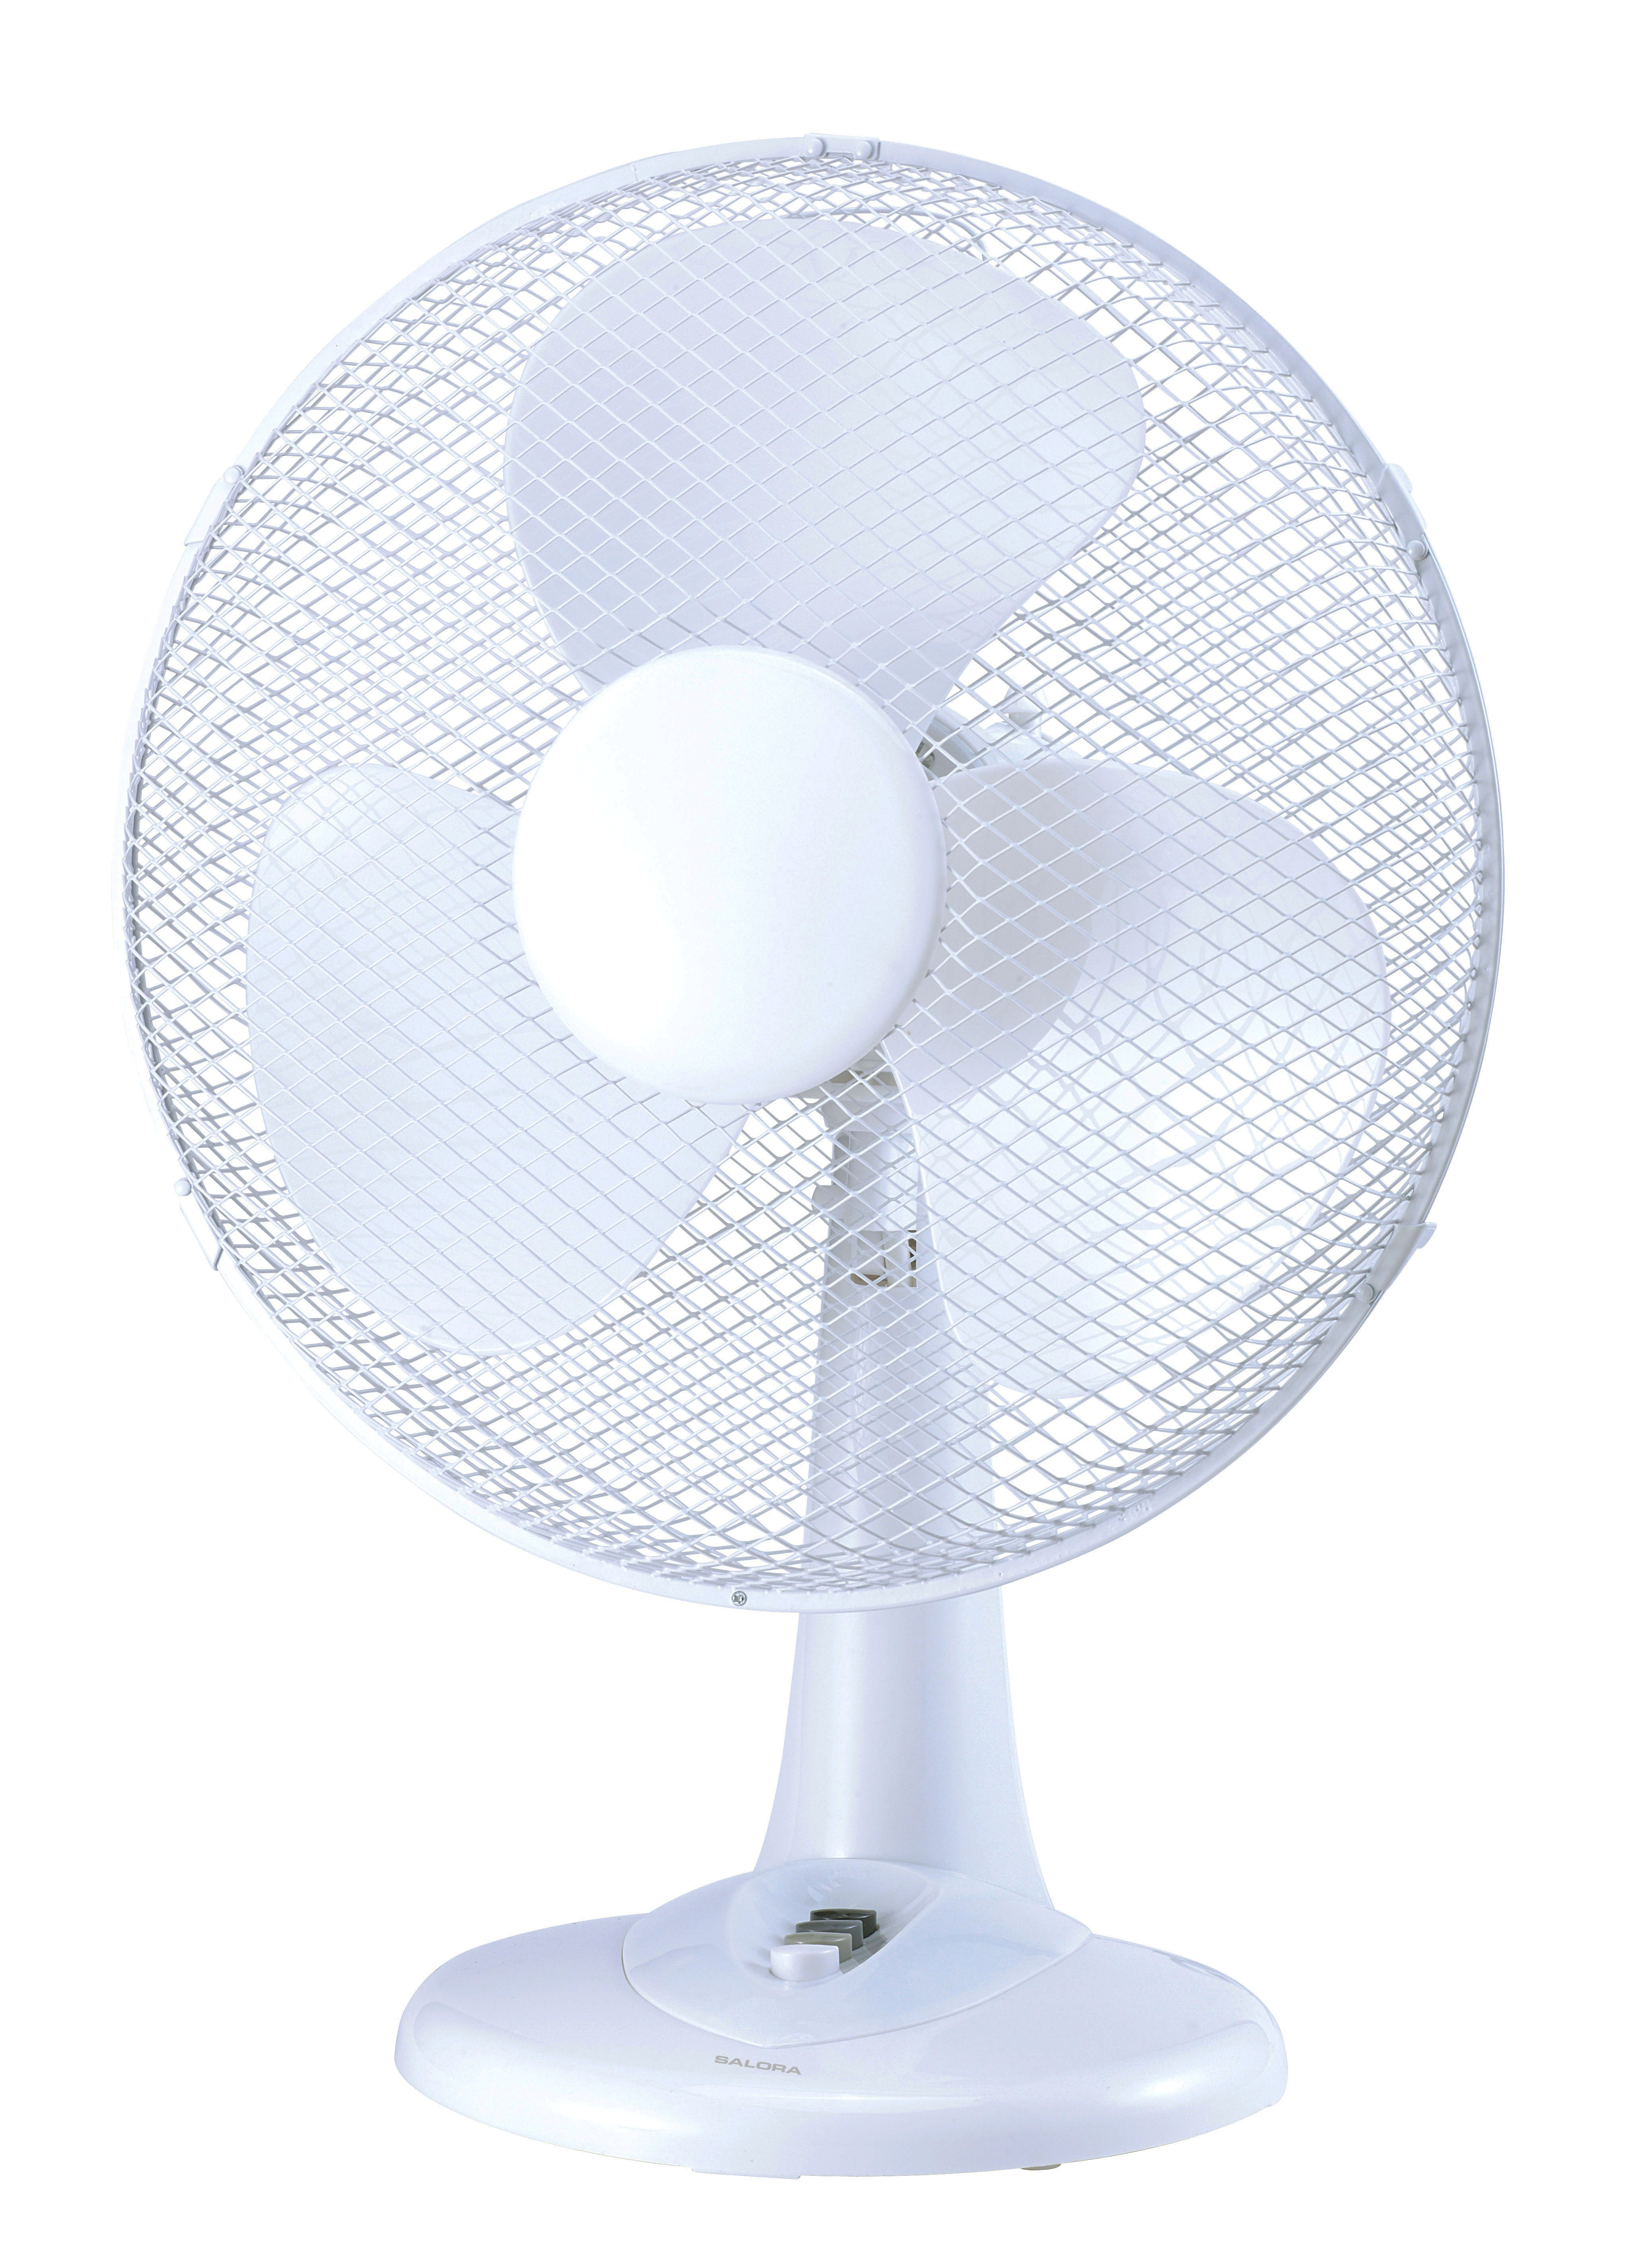 Korting Salora FT410 ventilator